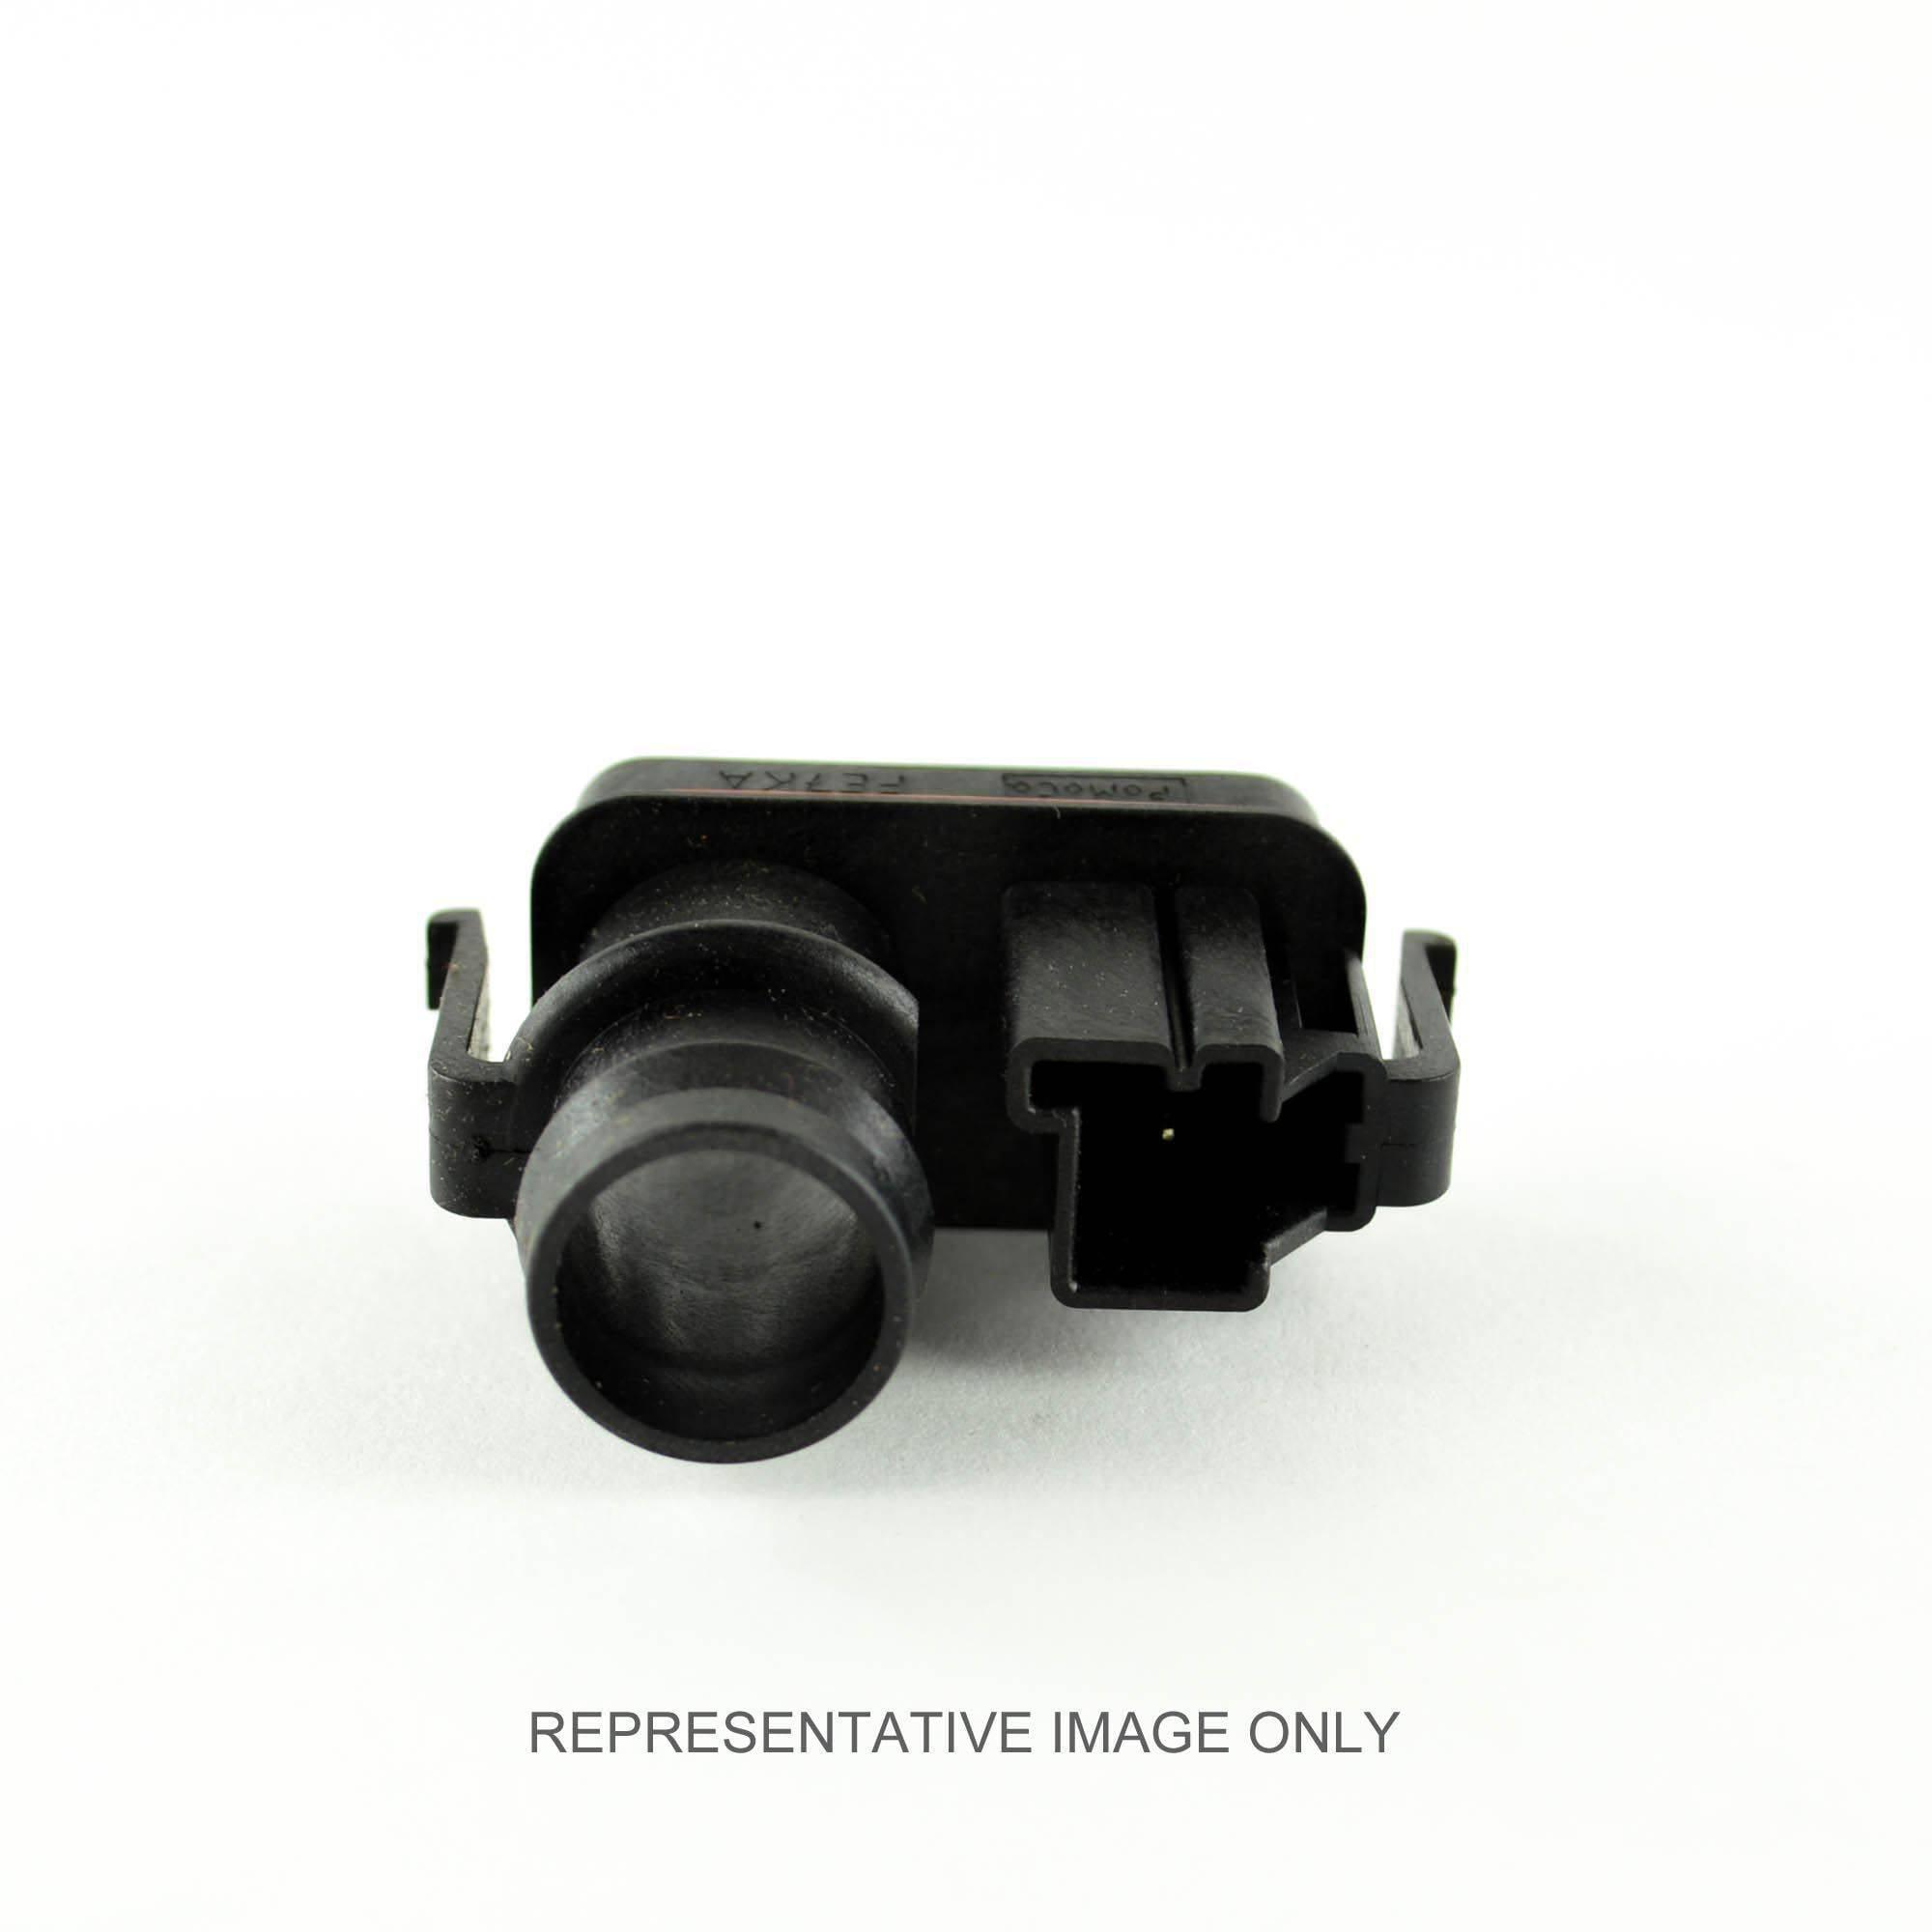 Motorcraft Ambient Temp Switch, MTCH1639